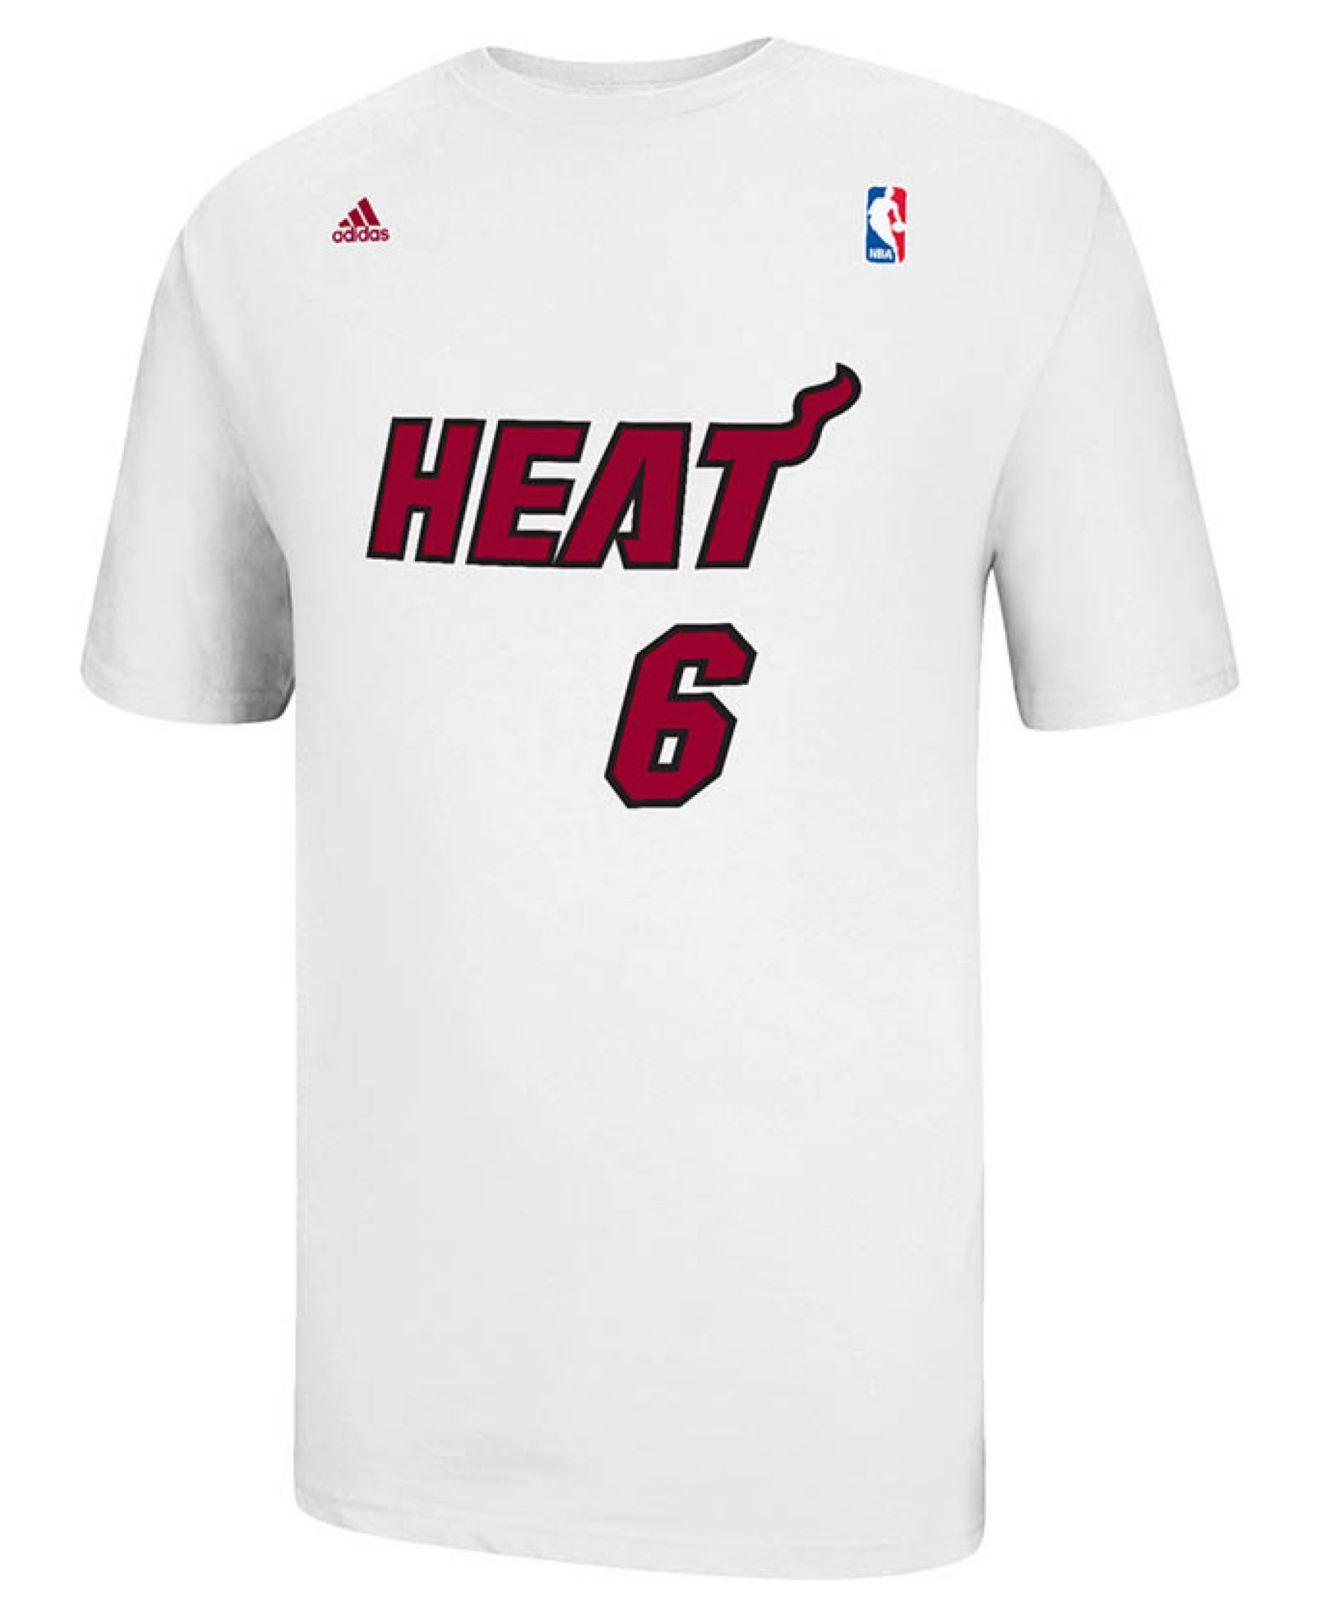 5595dffc262 Lyst - adidas Men's Miami Heat Lebron James Player T-shirt in White ...